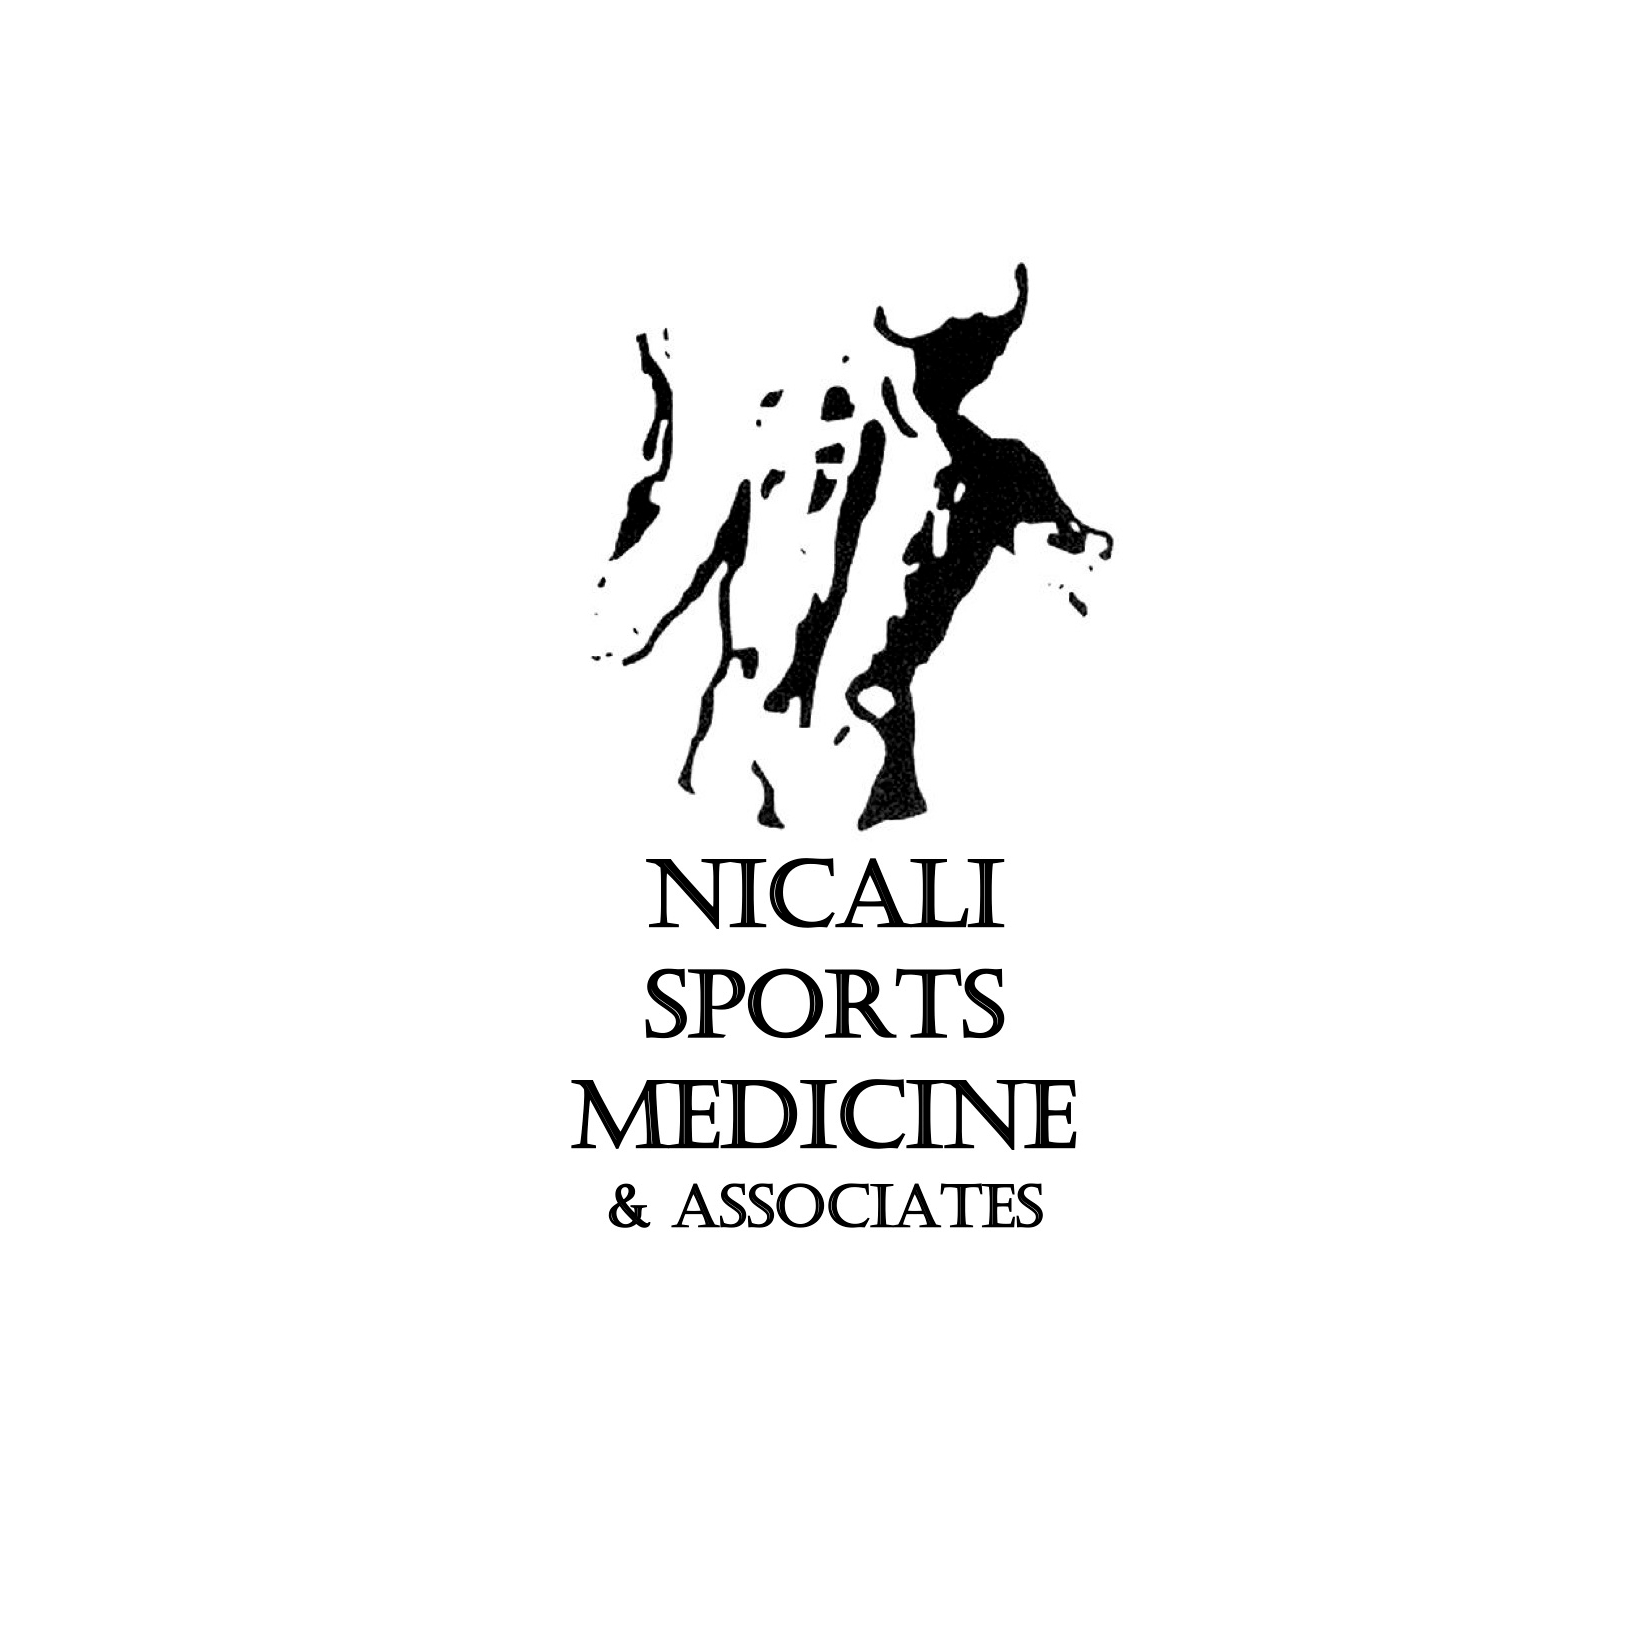 Nicali Sports Medicine and Associates